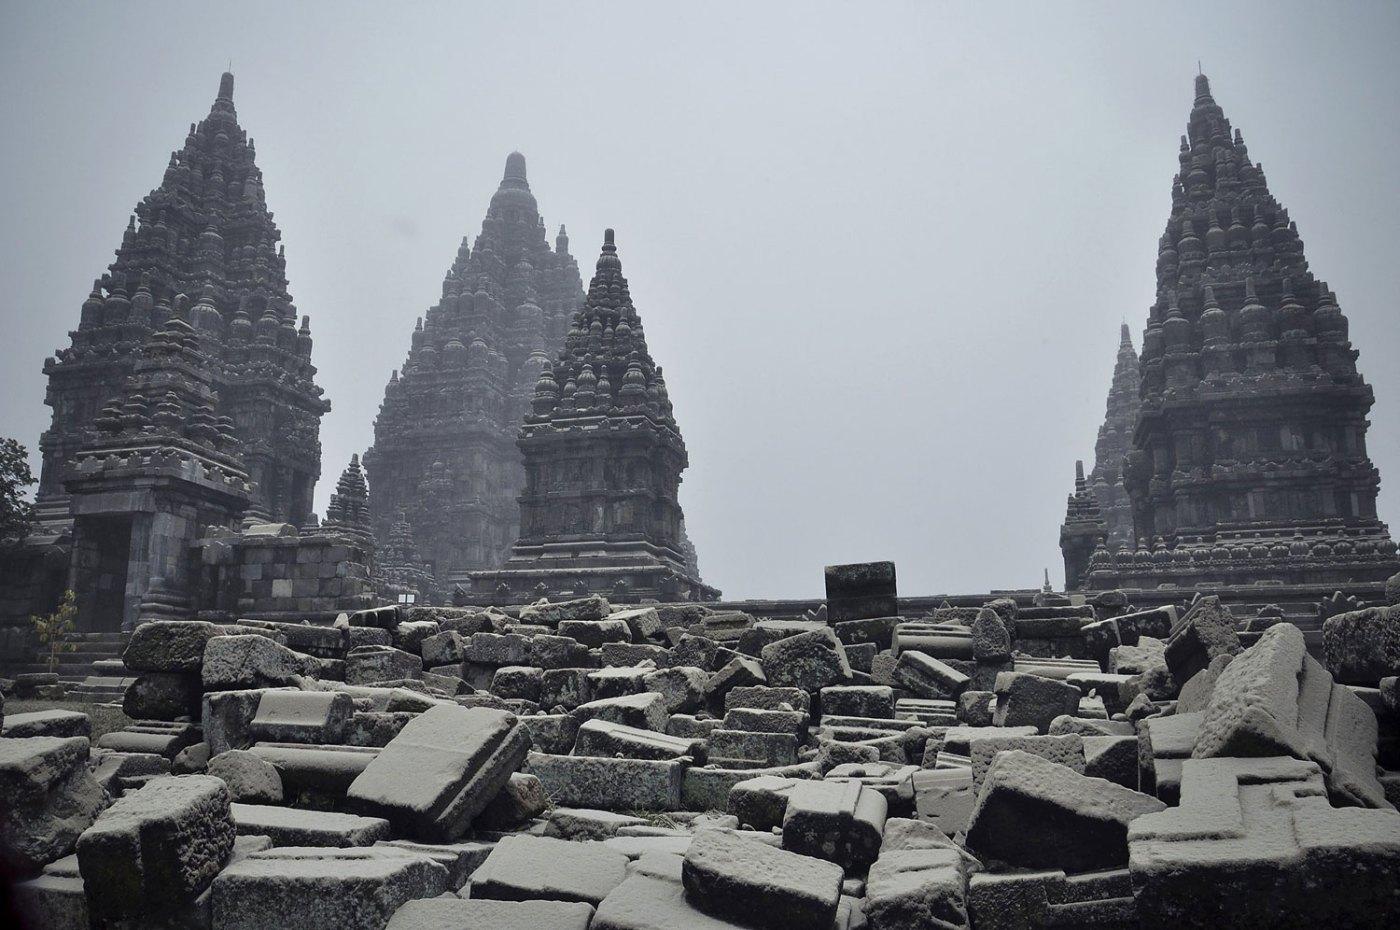 Views of Prambanan Temple covered by volcanic ash from Mount Kelud in Yogyakarta, Indonesia, Feb. 14, 2014.